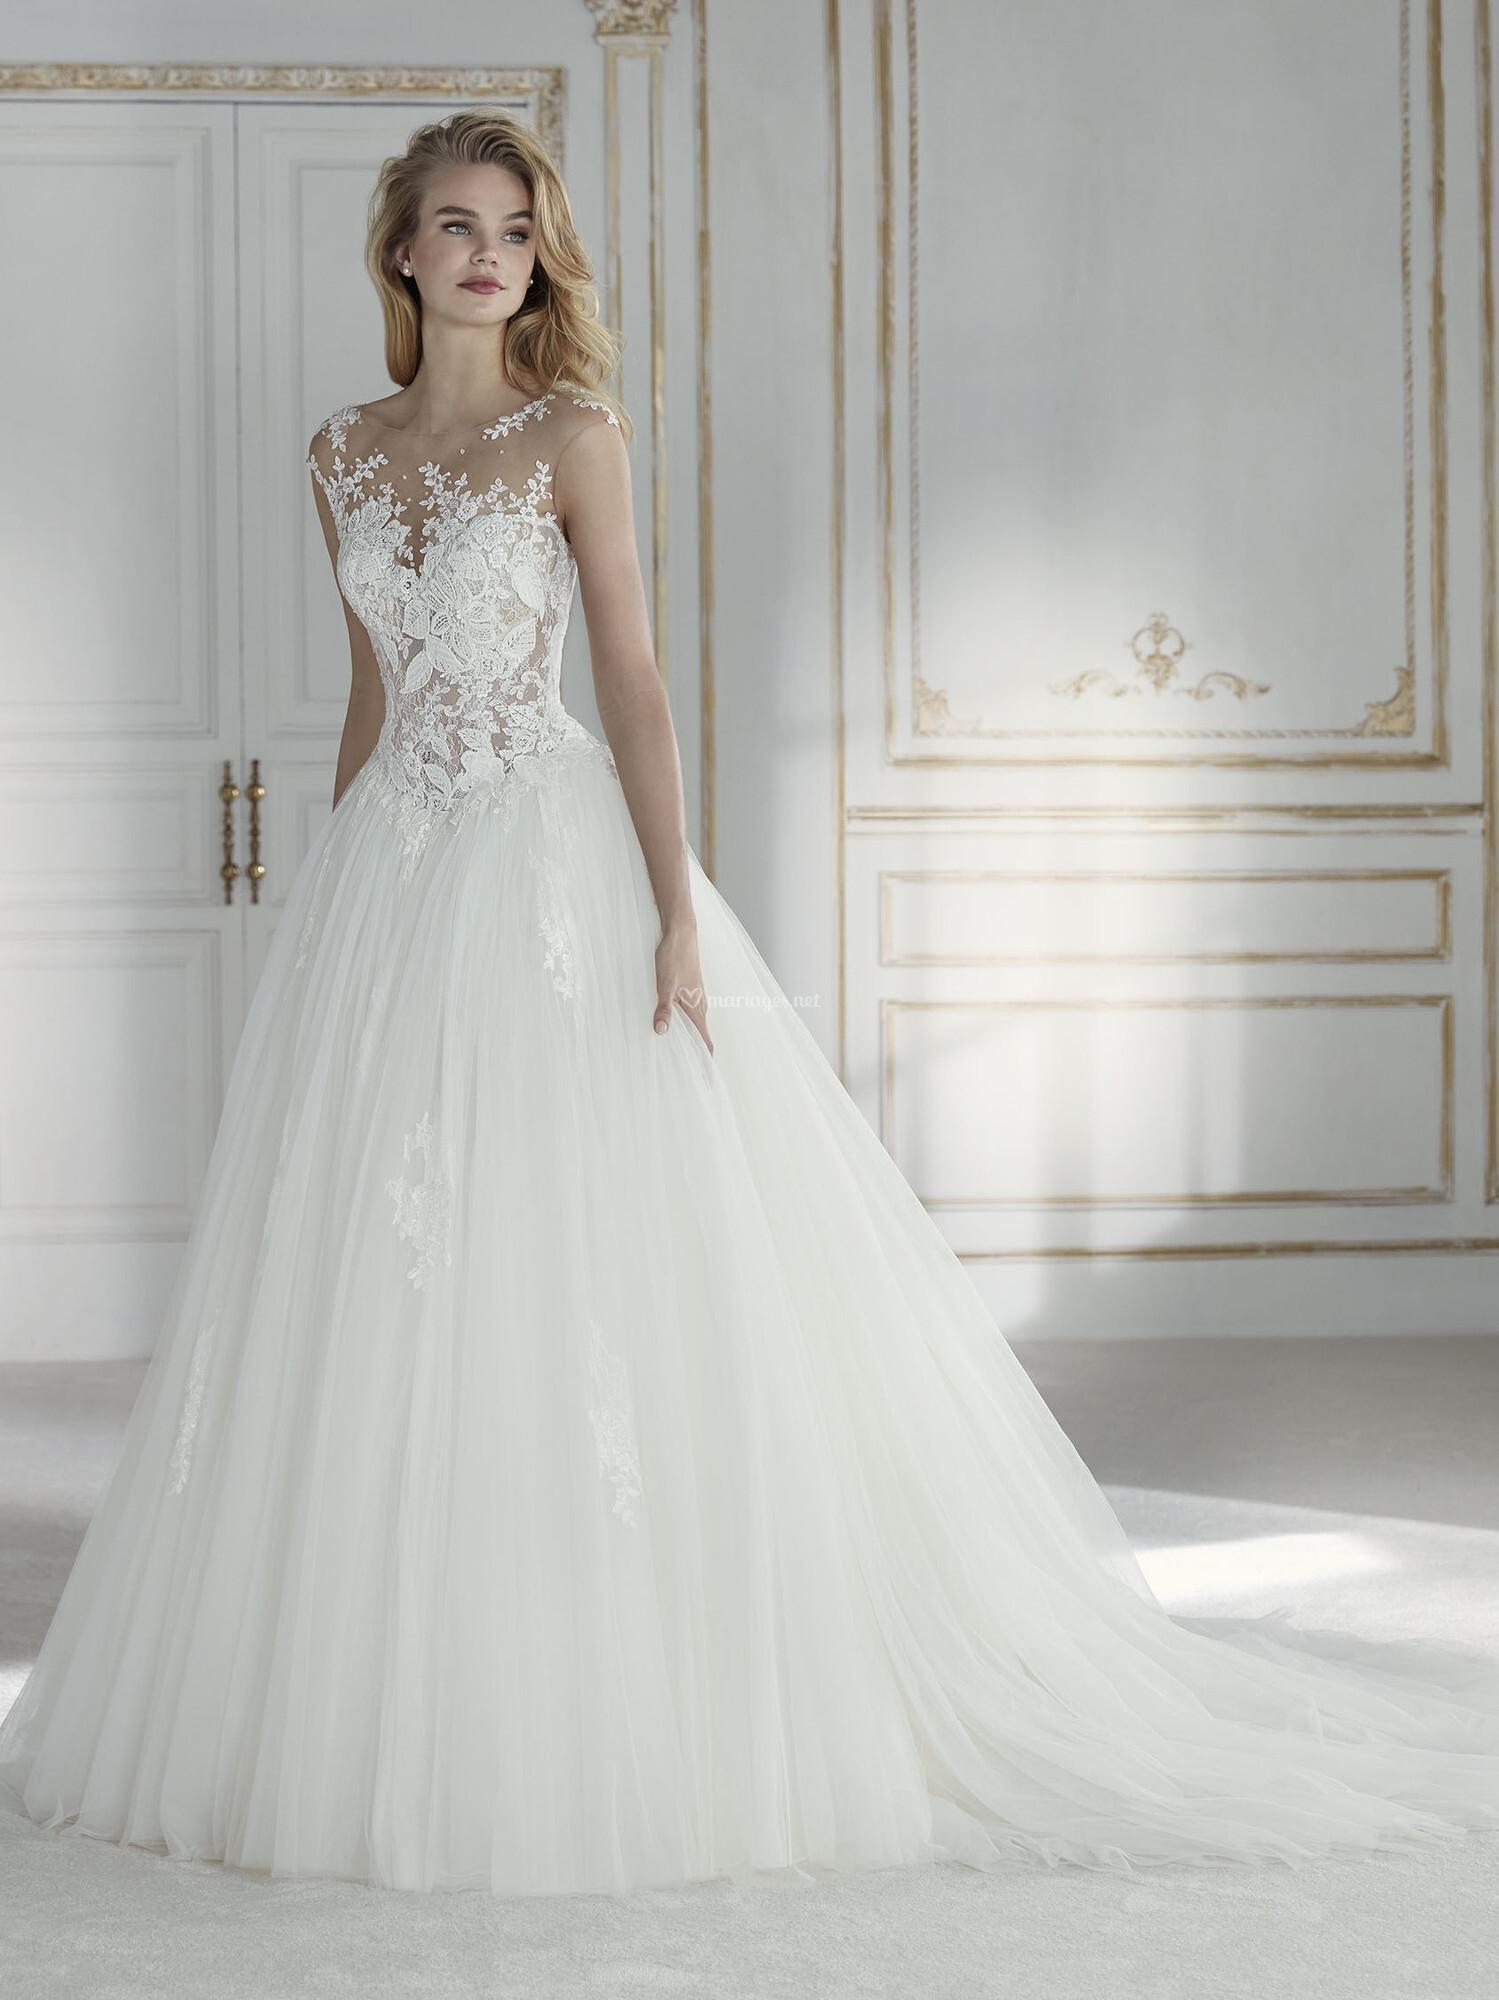 Robes de mari e de la sposa - Robe de mariee transparente ...